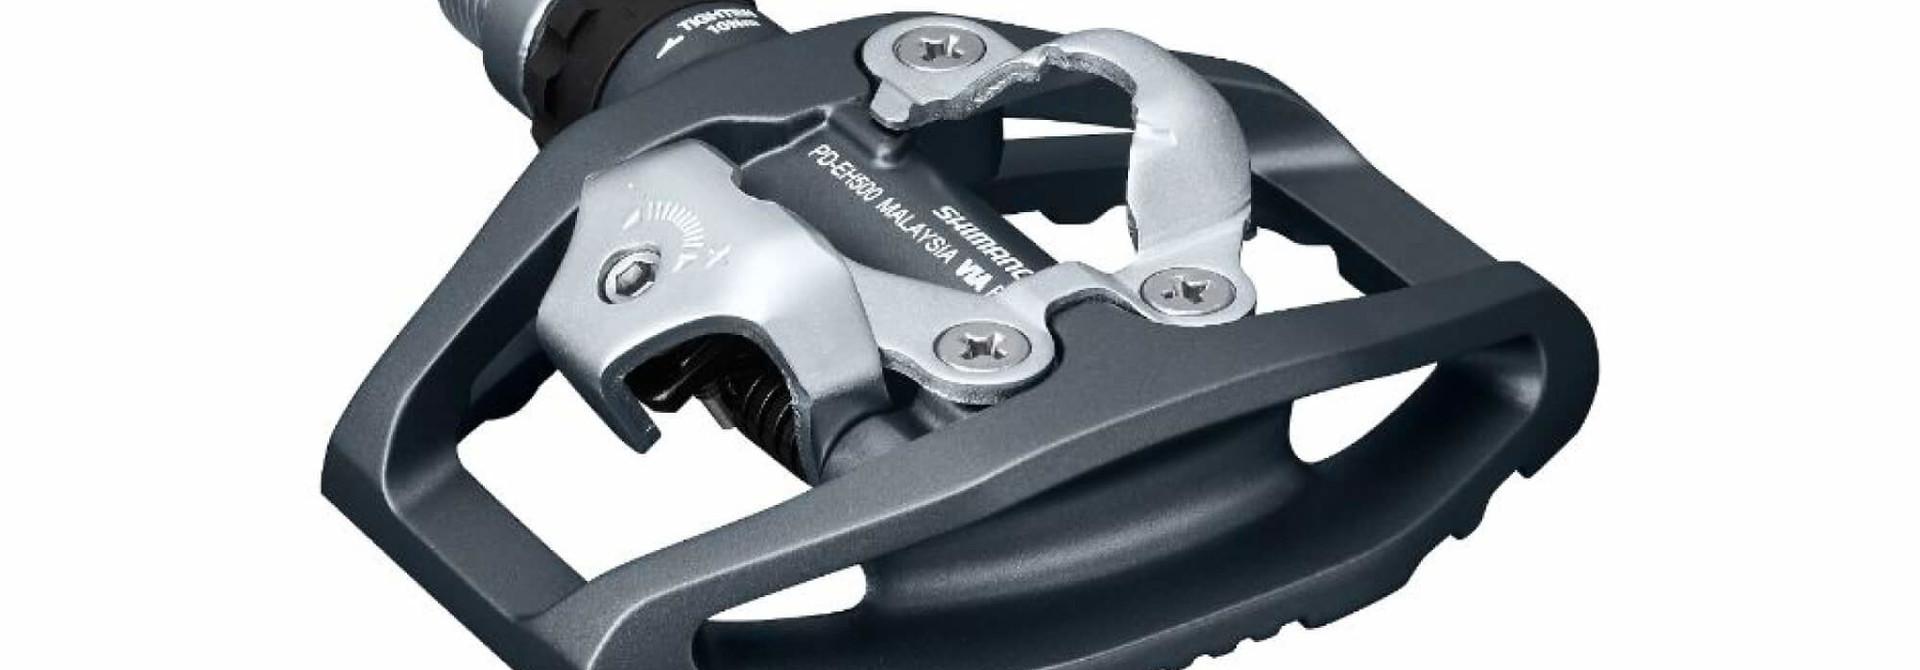 PD-EH500 SPD Pedals Explorer Flat Side / SPD Side